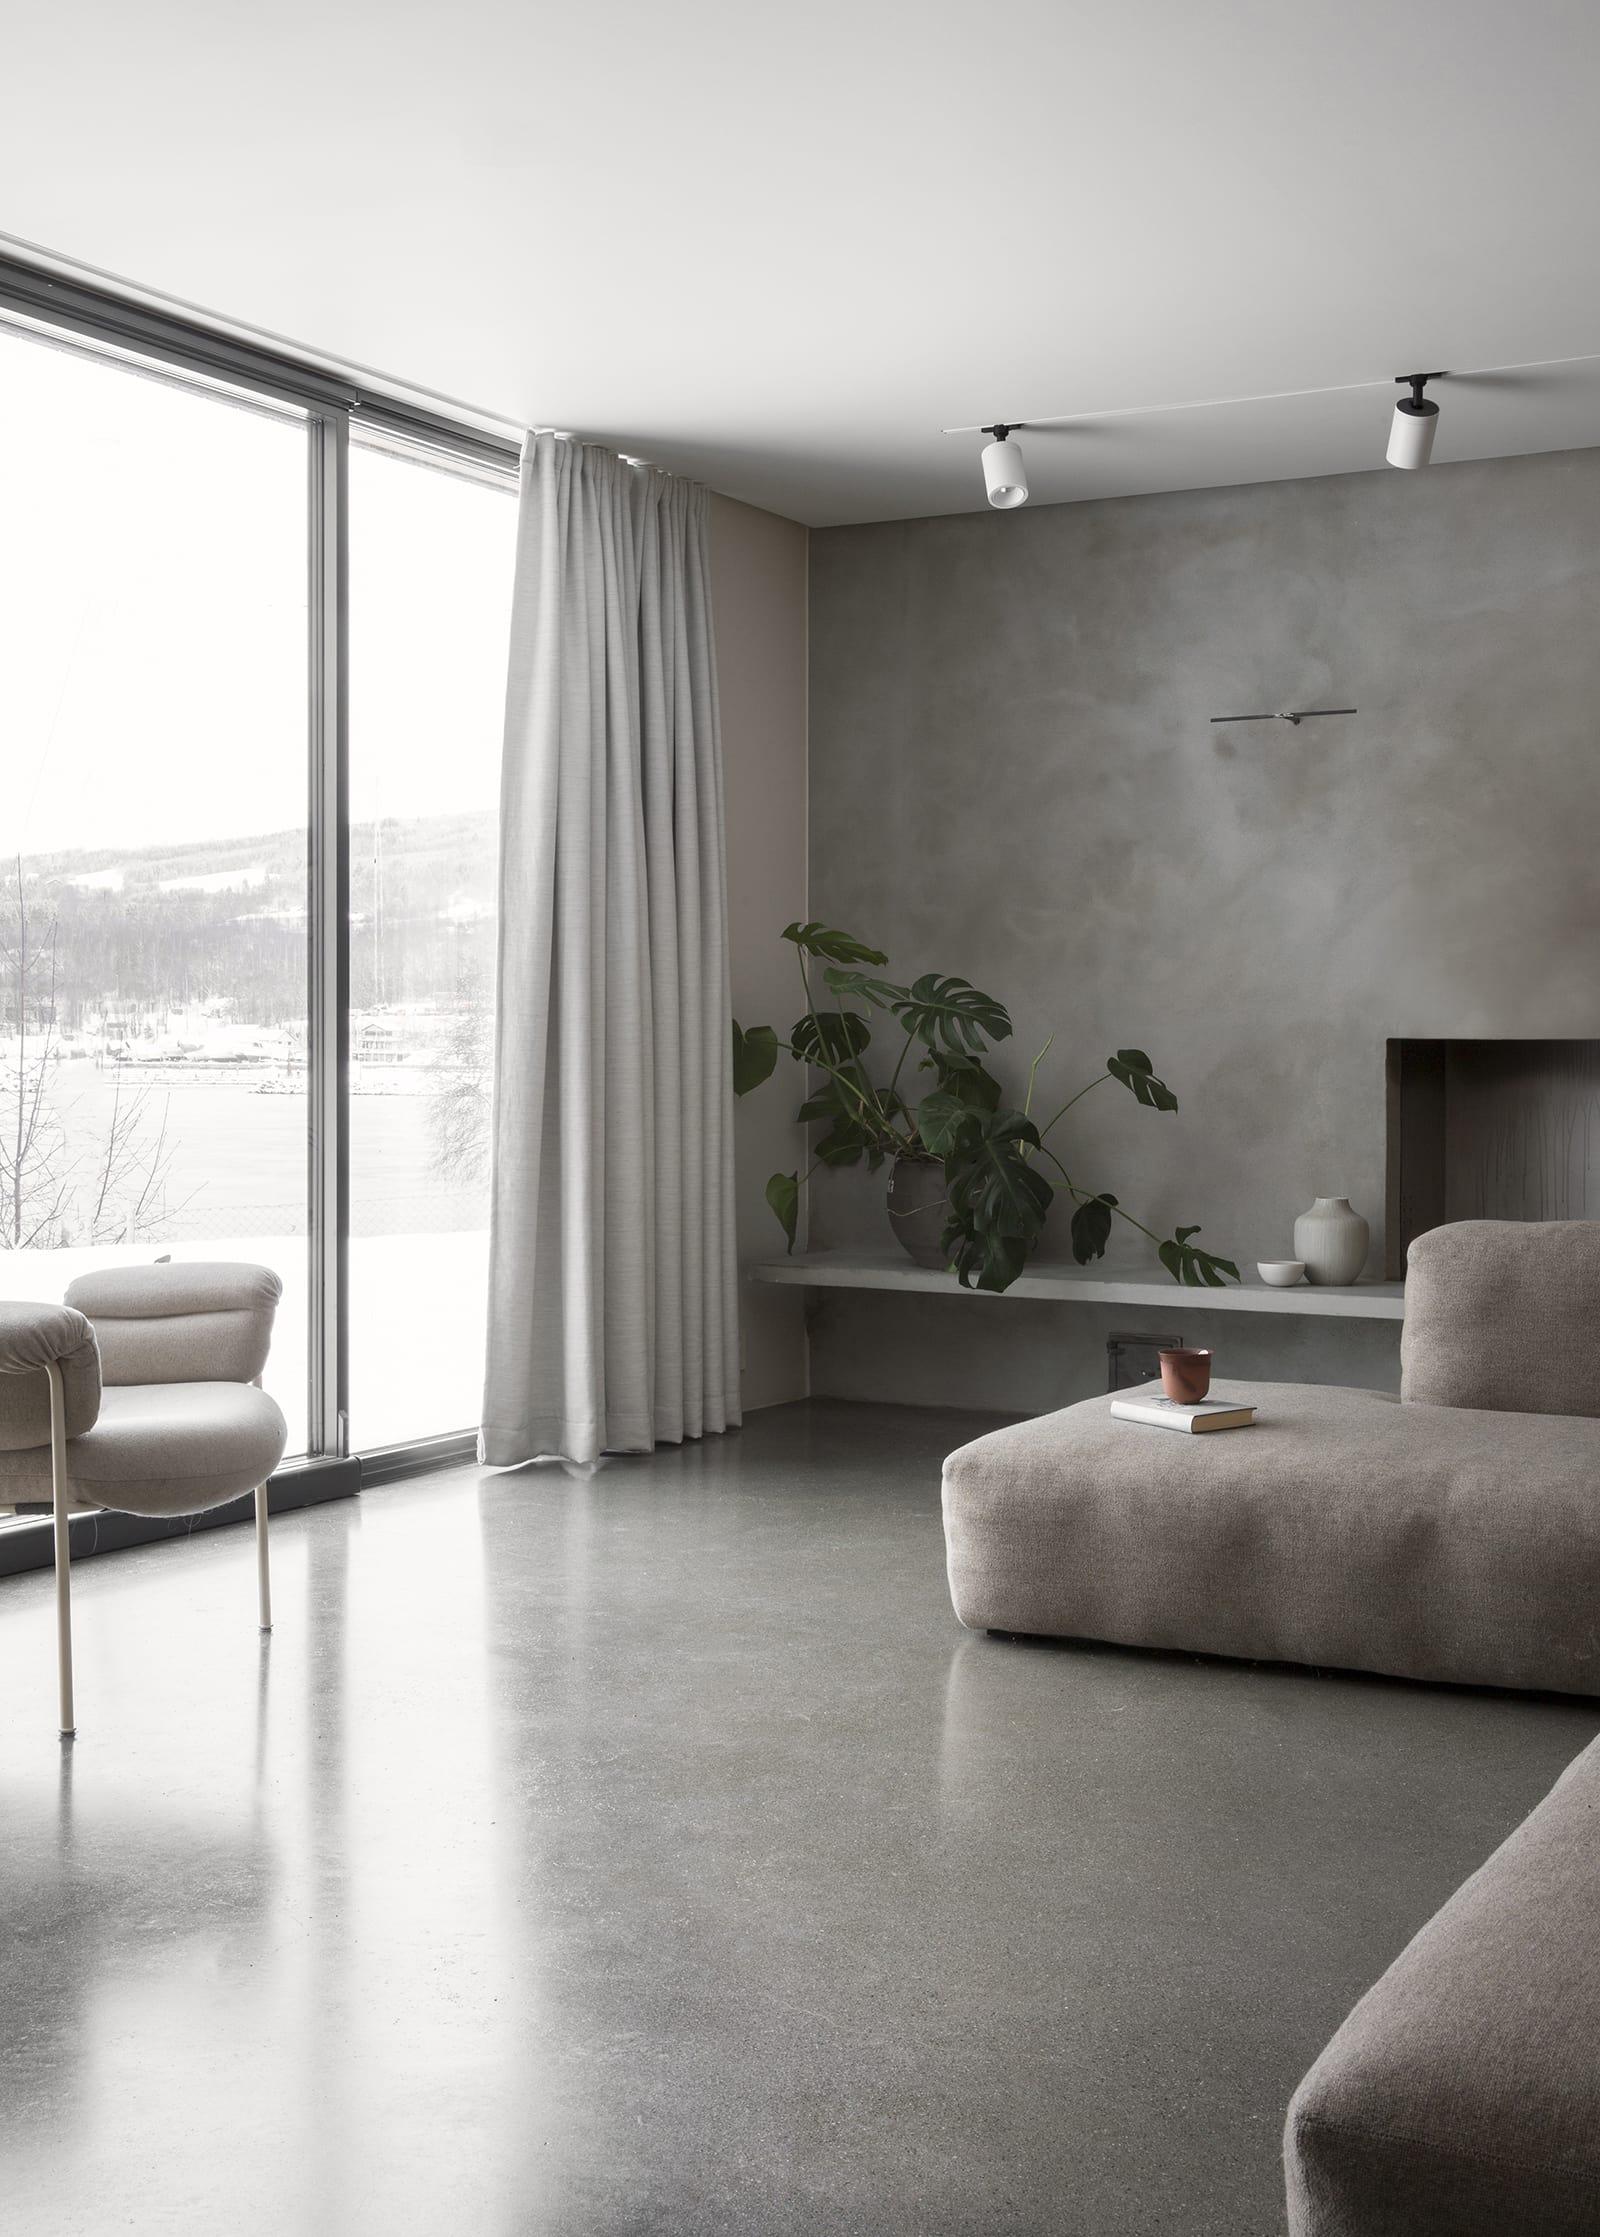 The gj vik house coco lapine designcoco lapine design for Casa minimalista interior